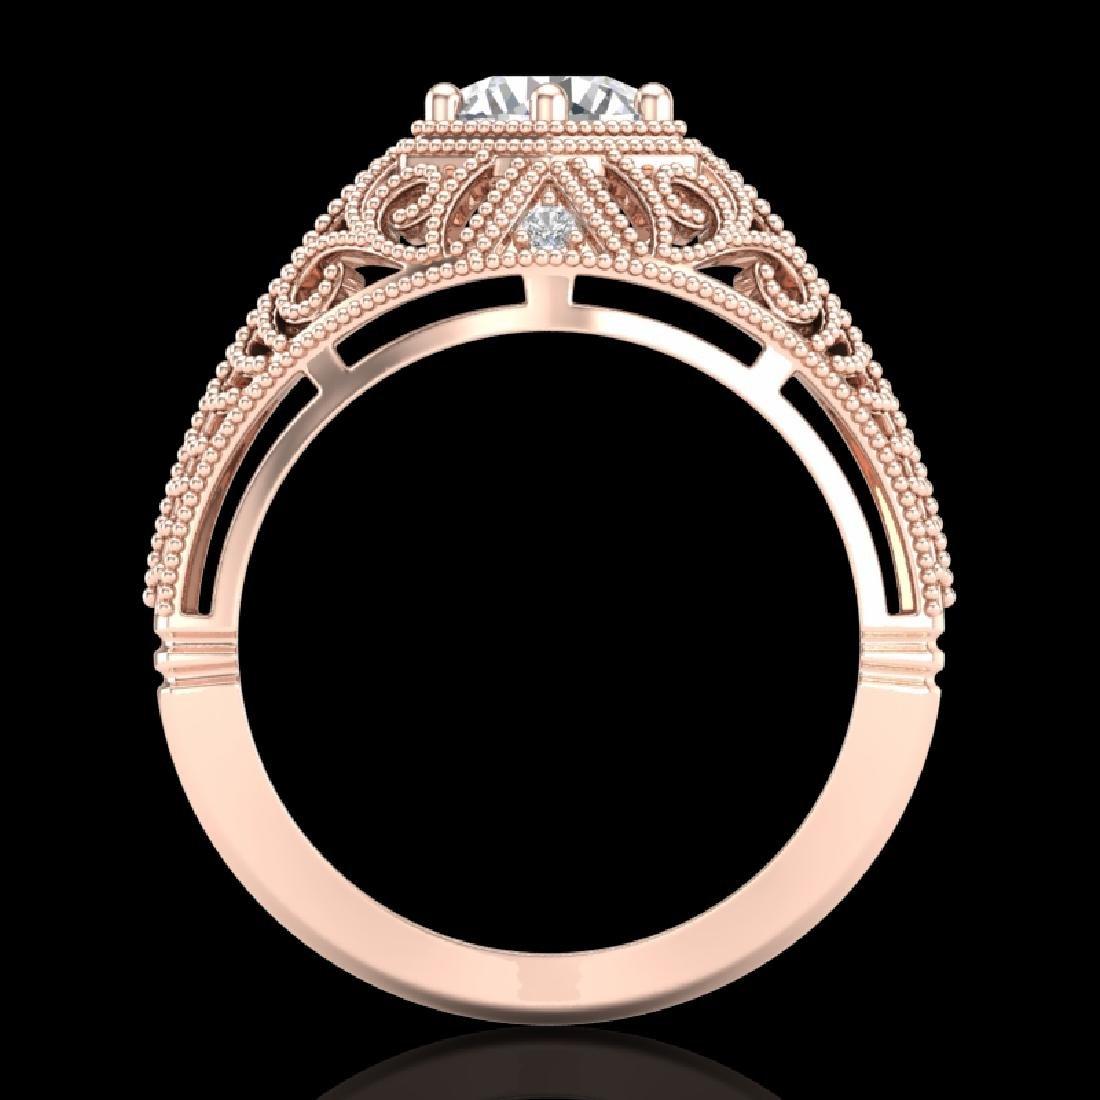 1.07 CTW VS/SI Diamond Solitaire Art Deco Ring 18K Rose